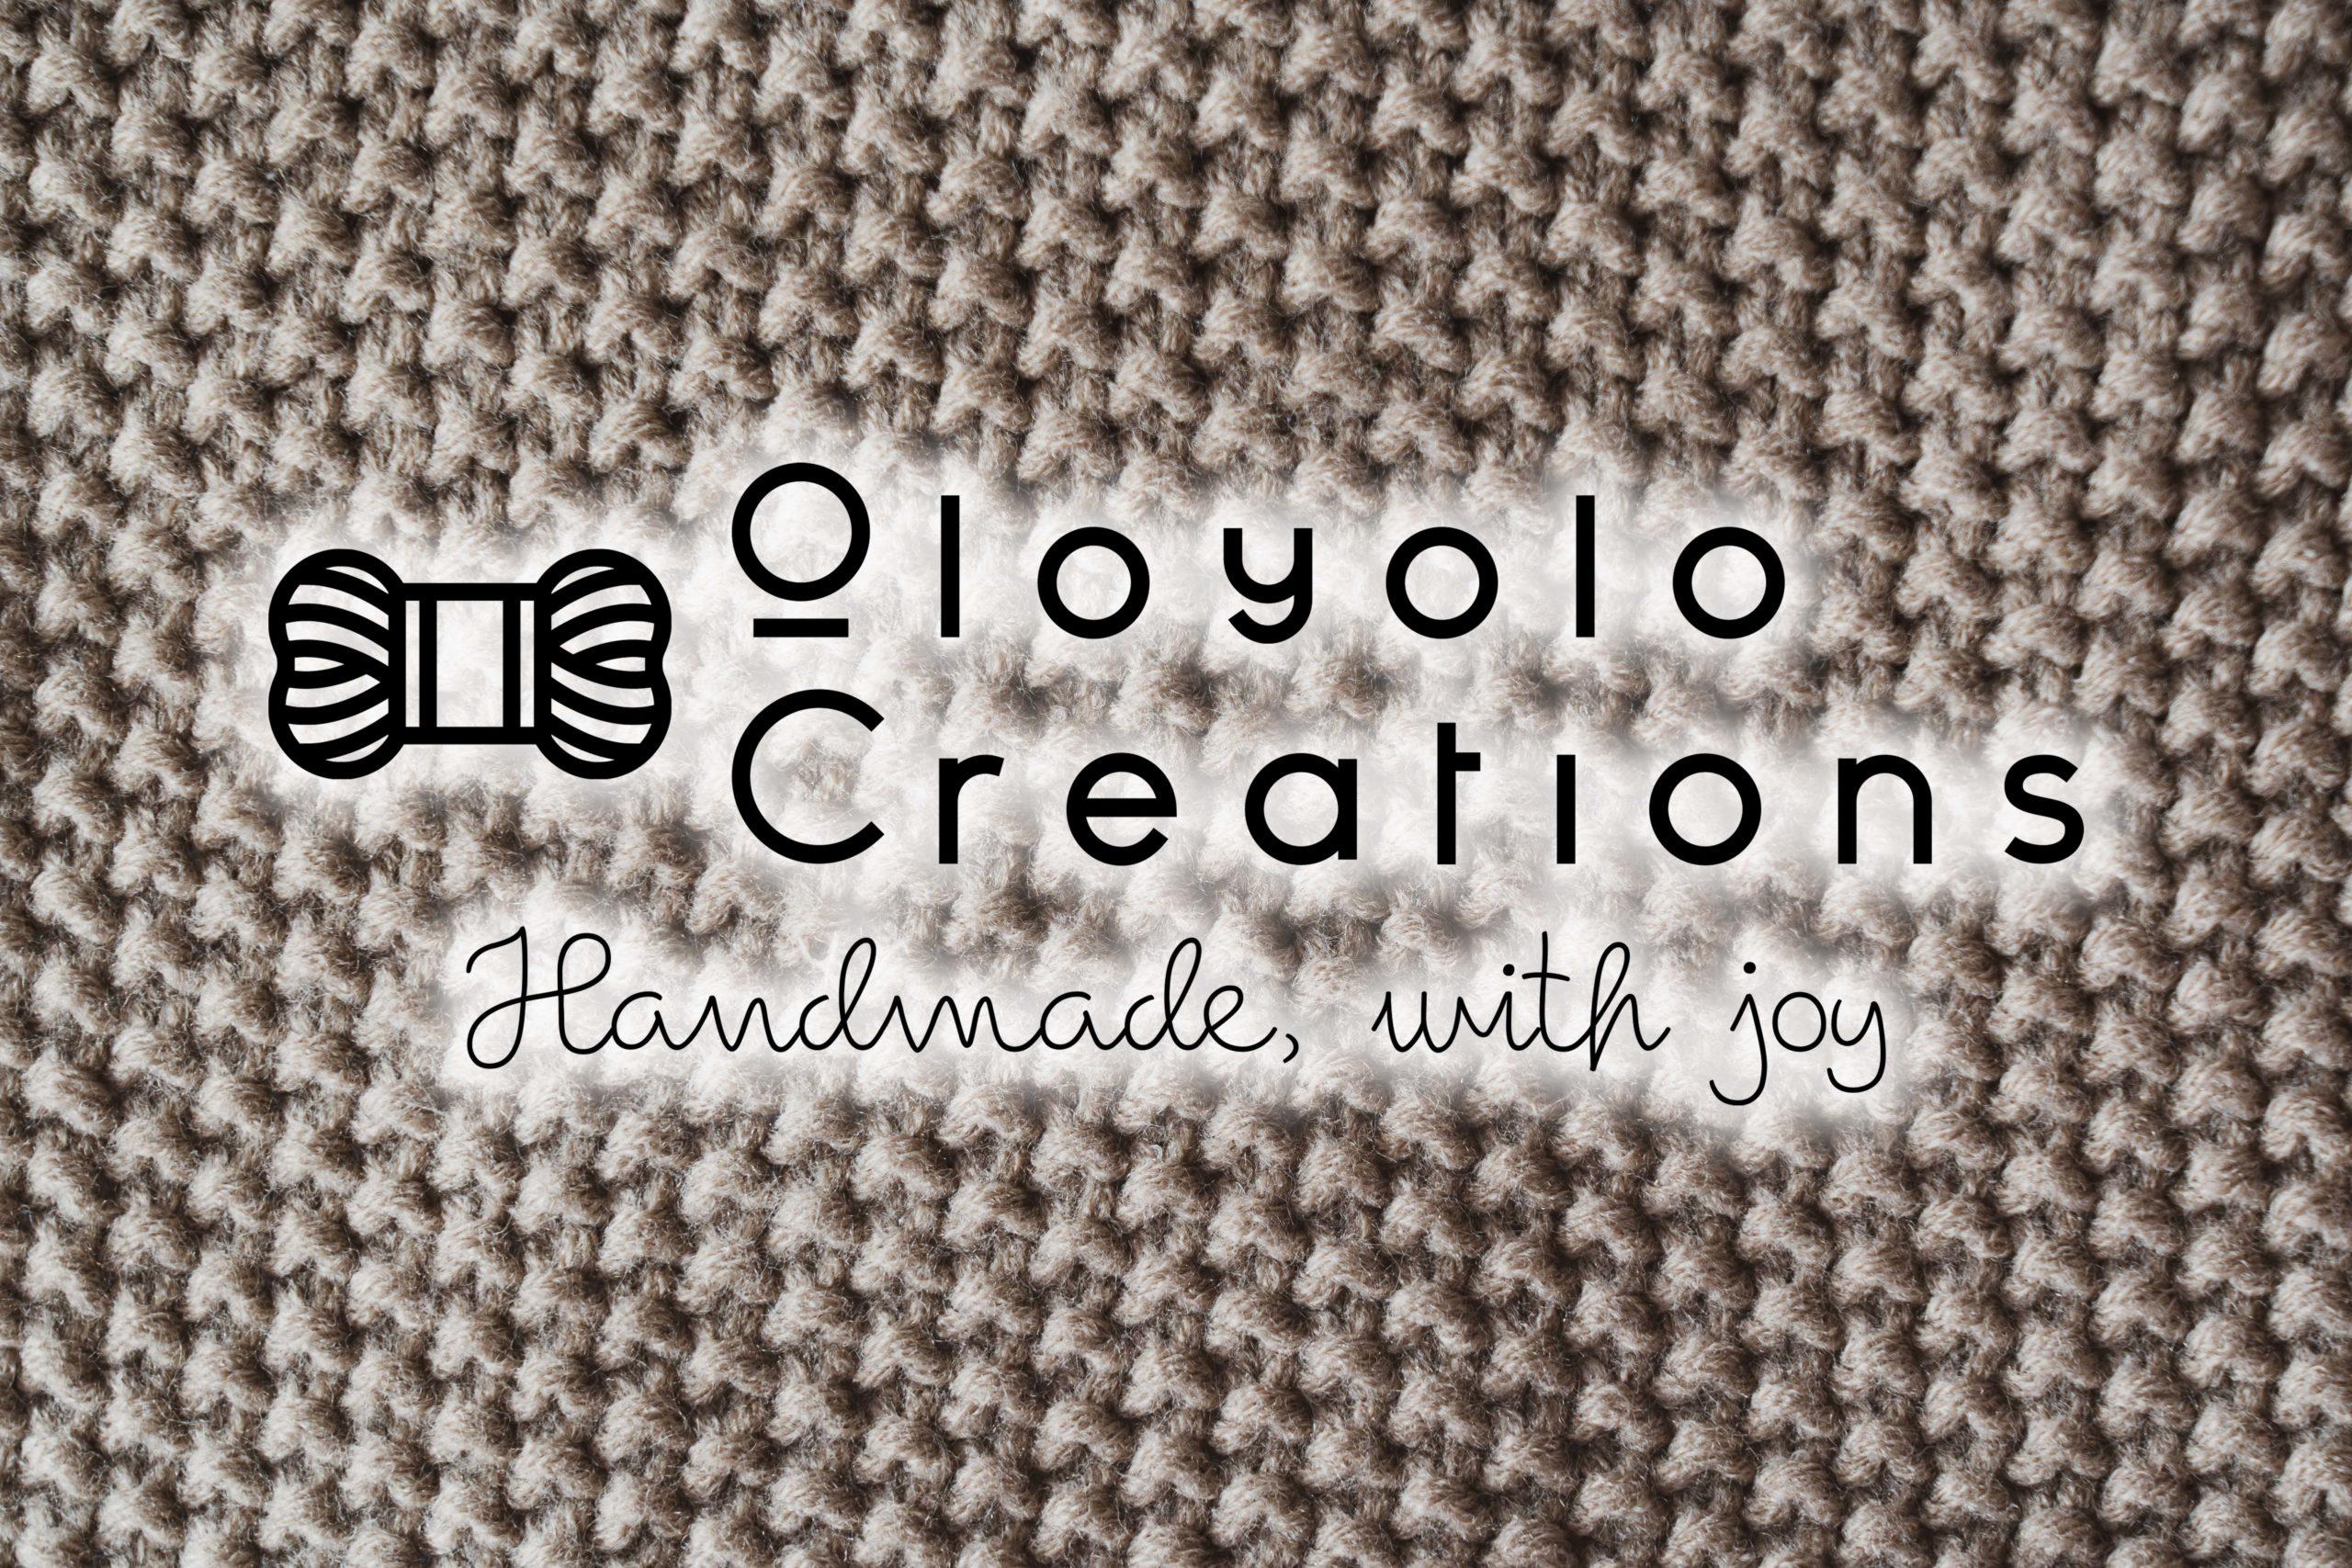 Oloyolo Creations